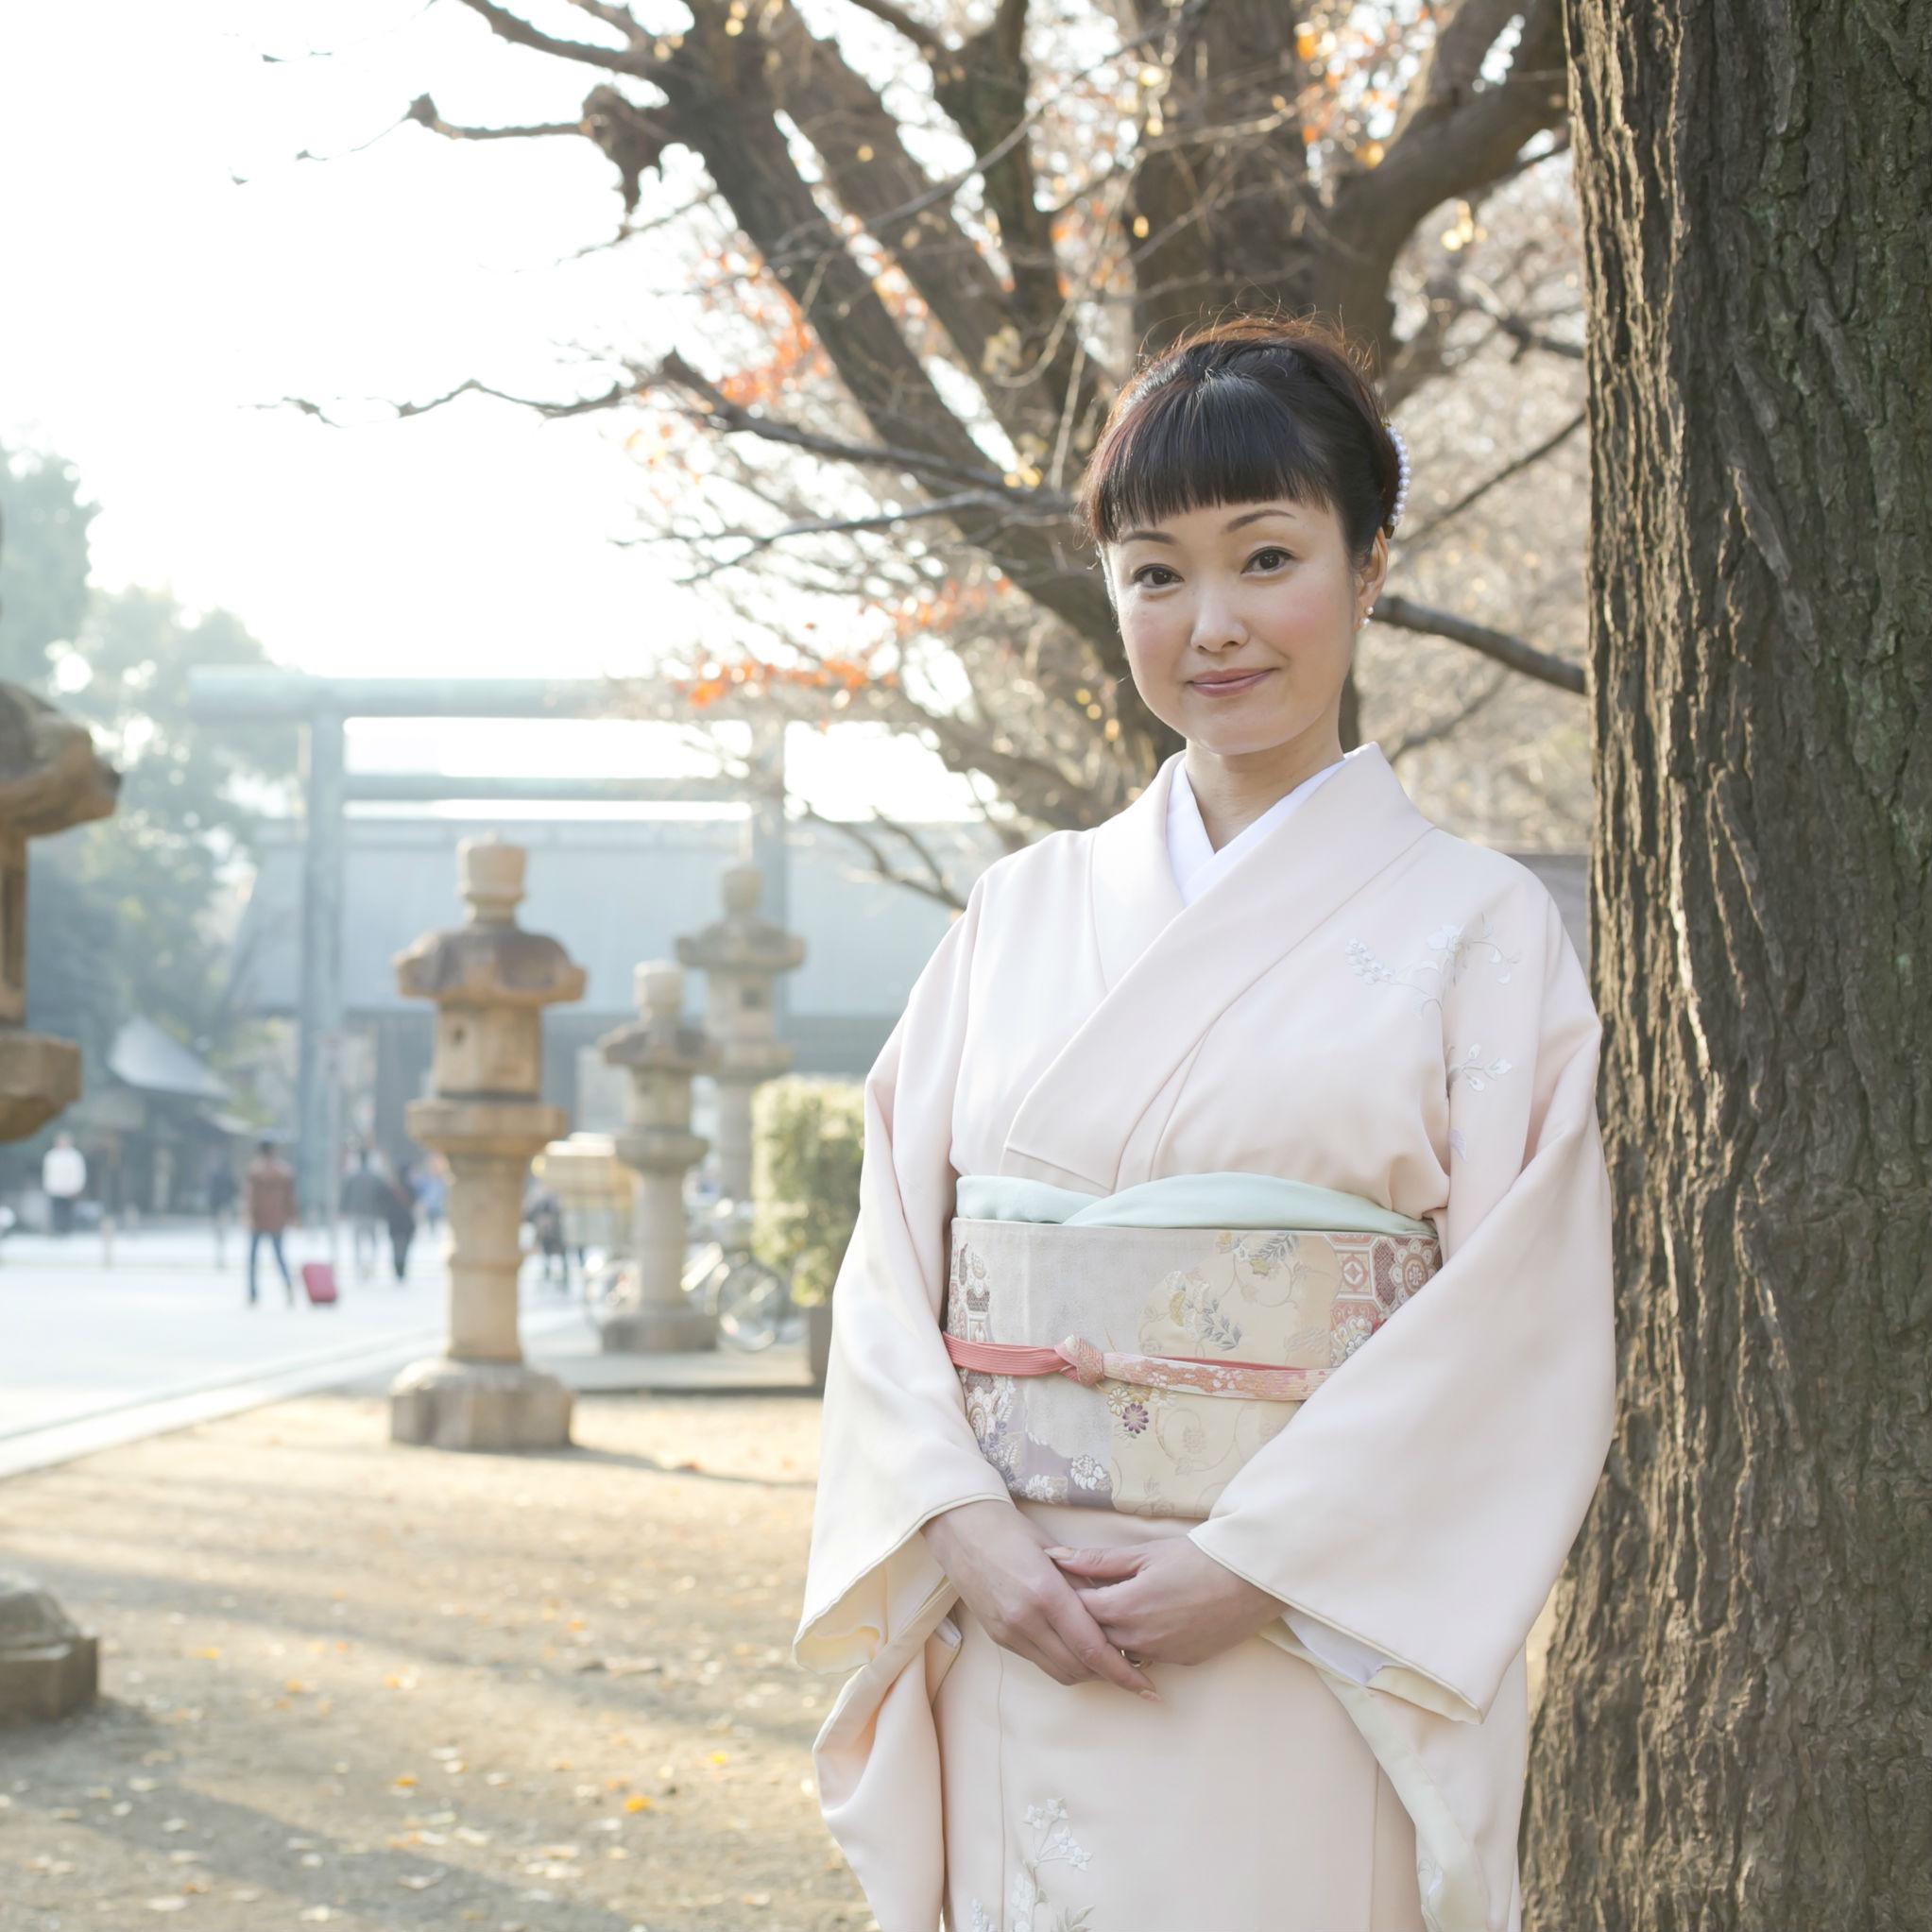 日本の道徳教育は実質、崩壊状態